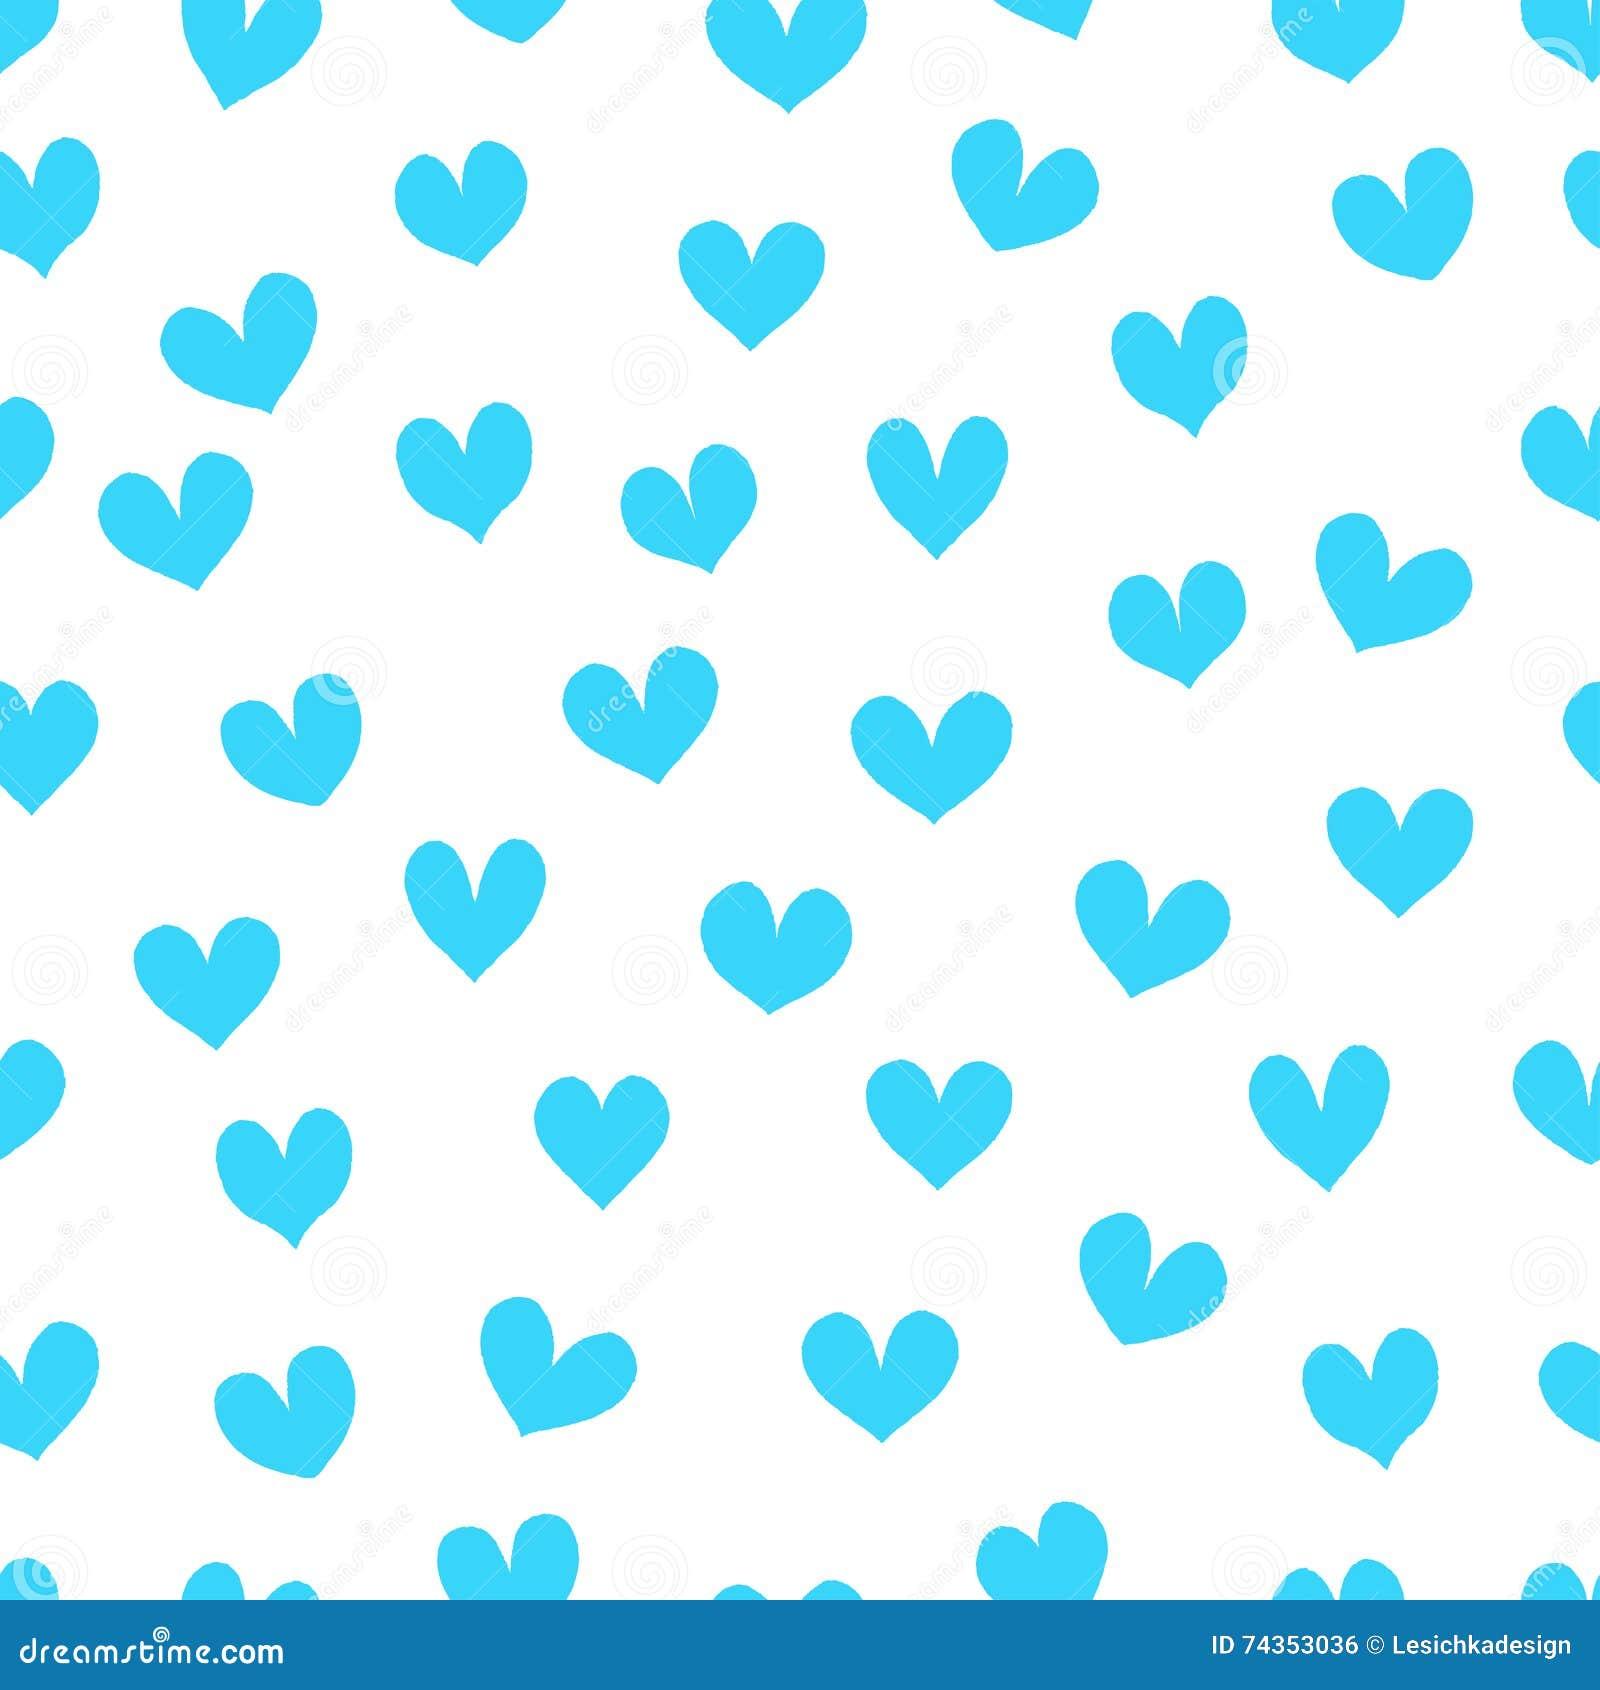 light blue heart background - photo #9